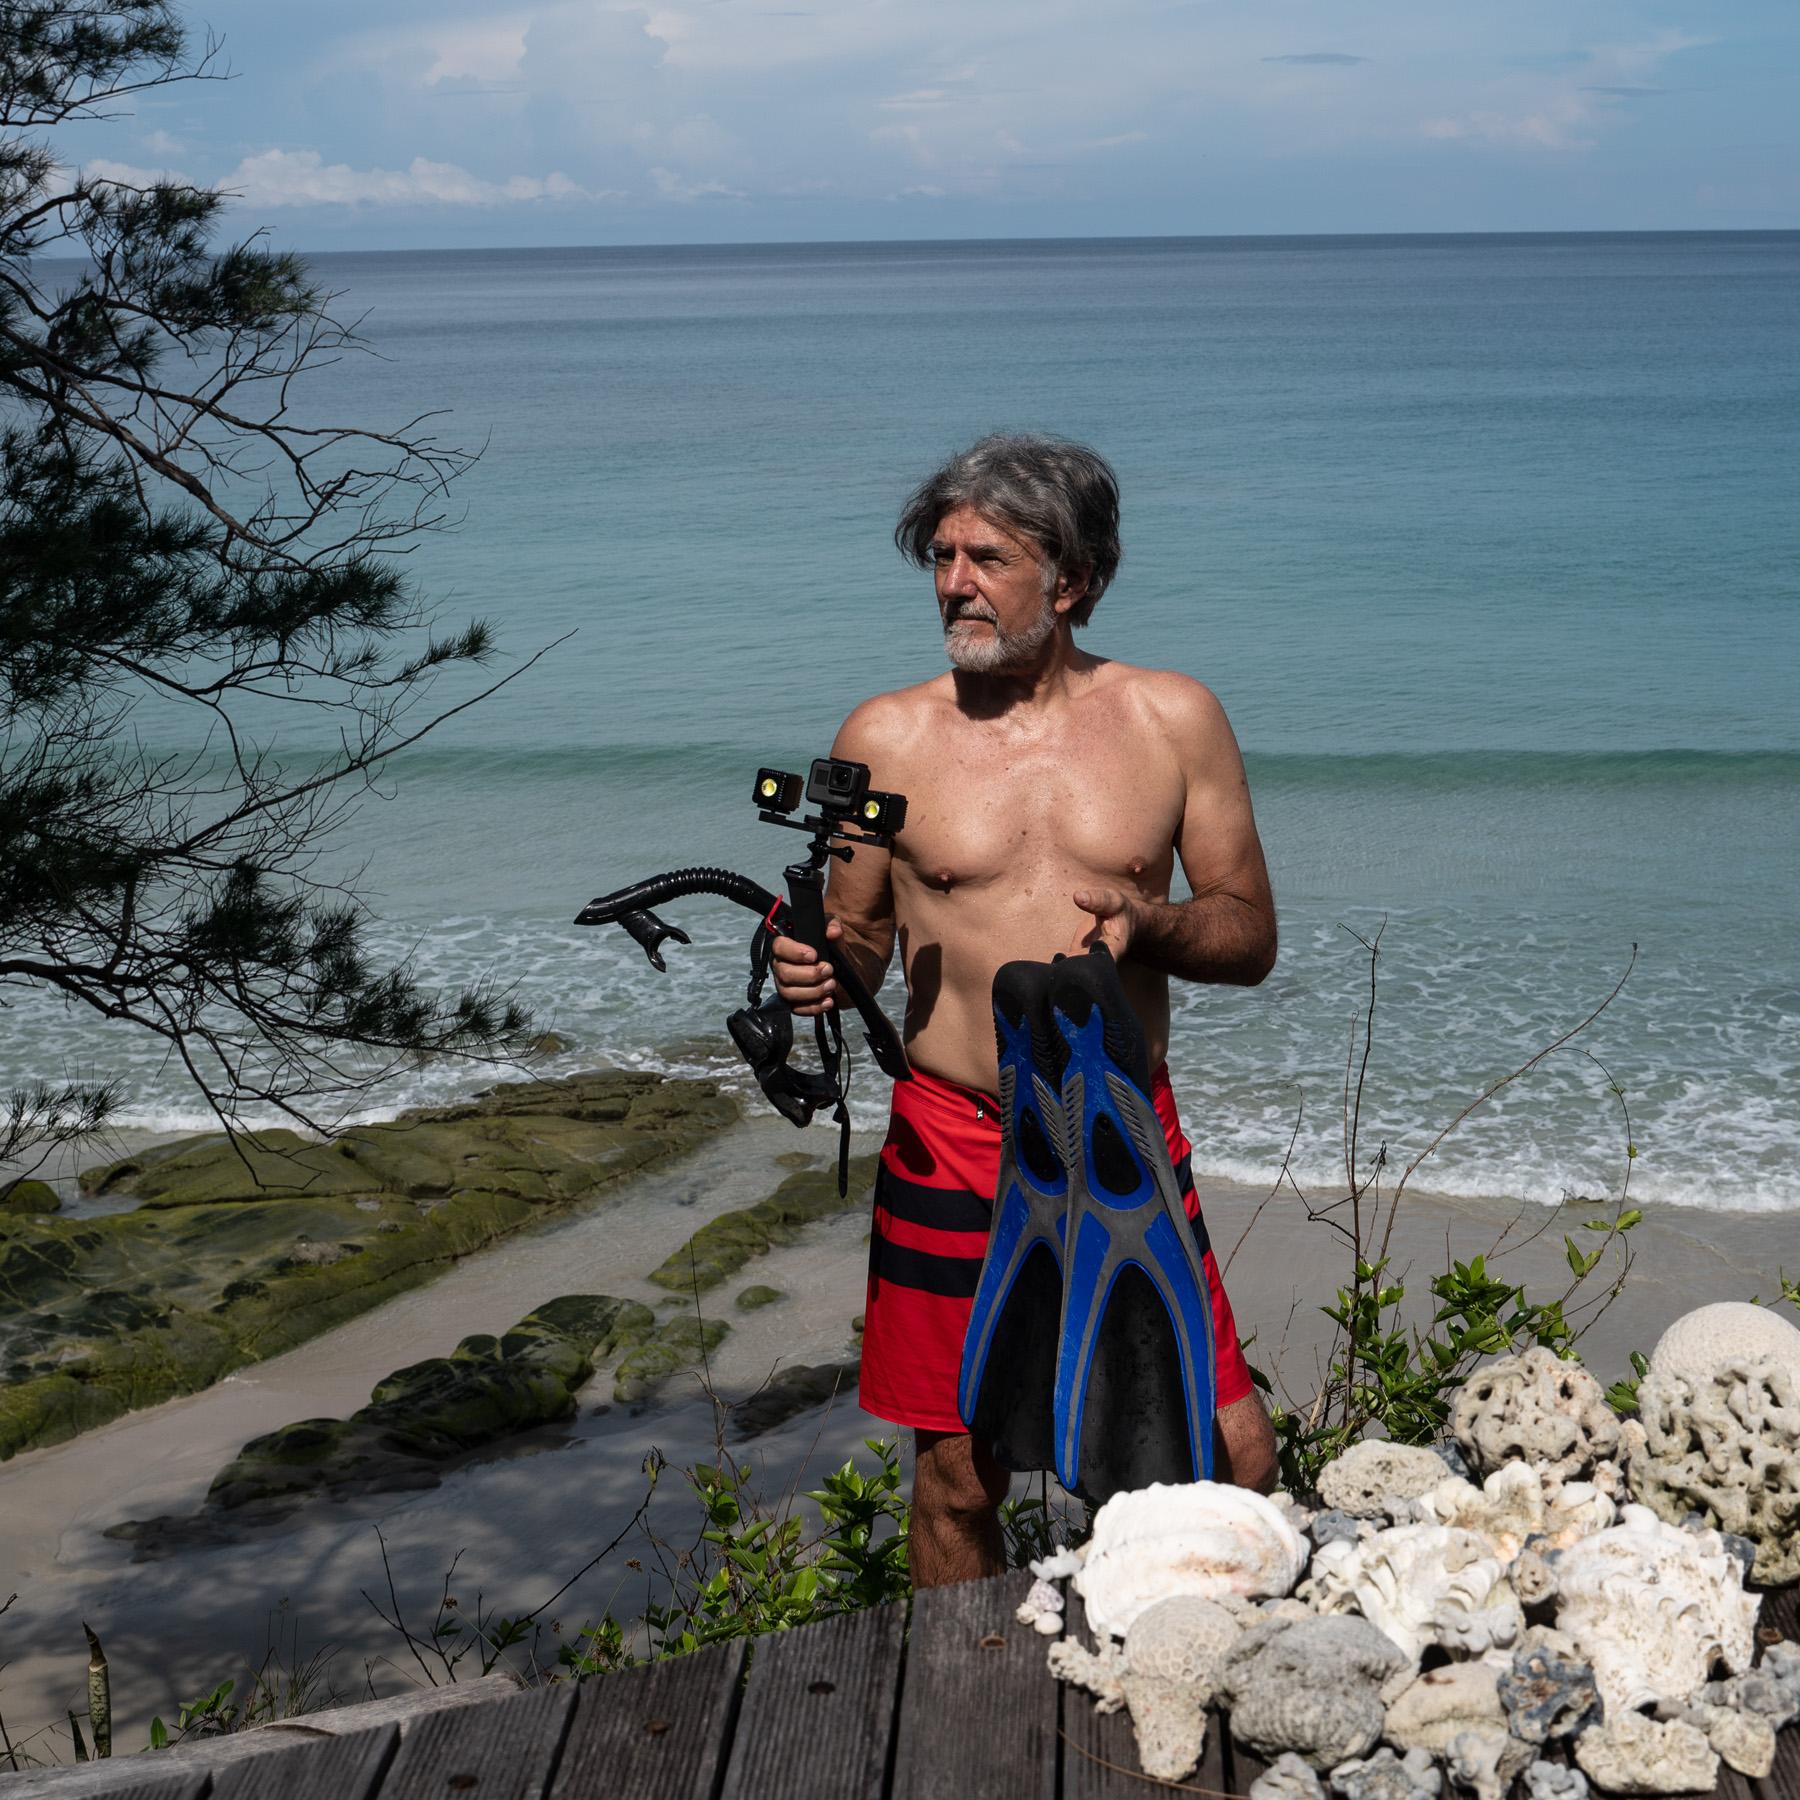 Malaysia_Borneo_Hibiscus Beach Retreat Binge 13